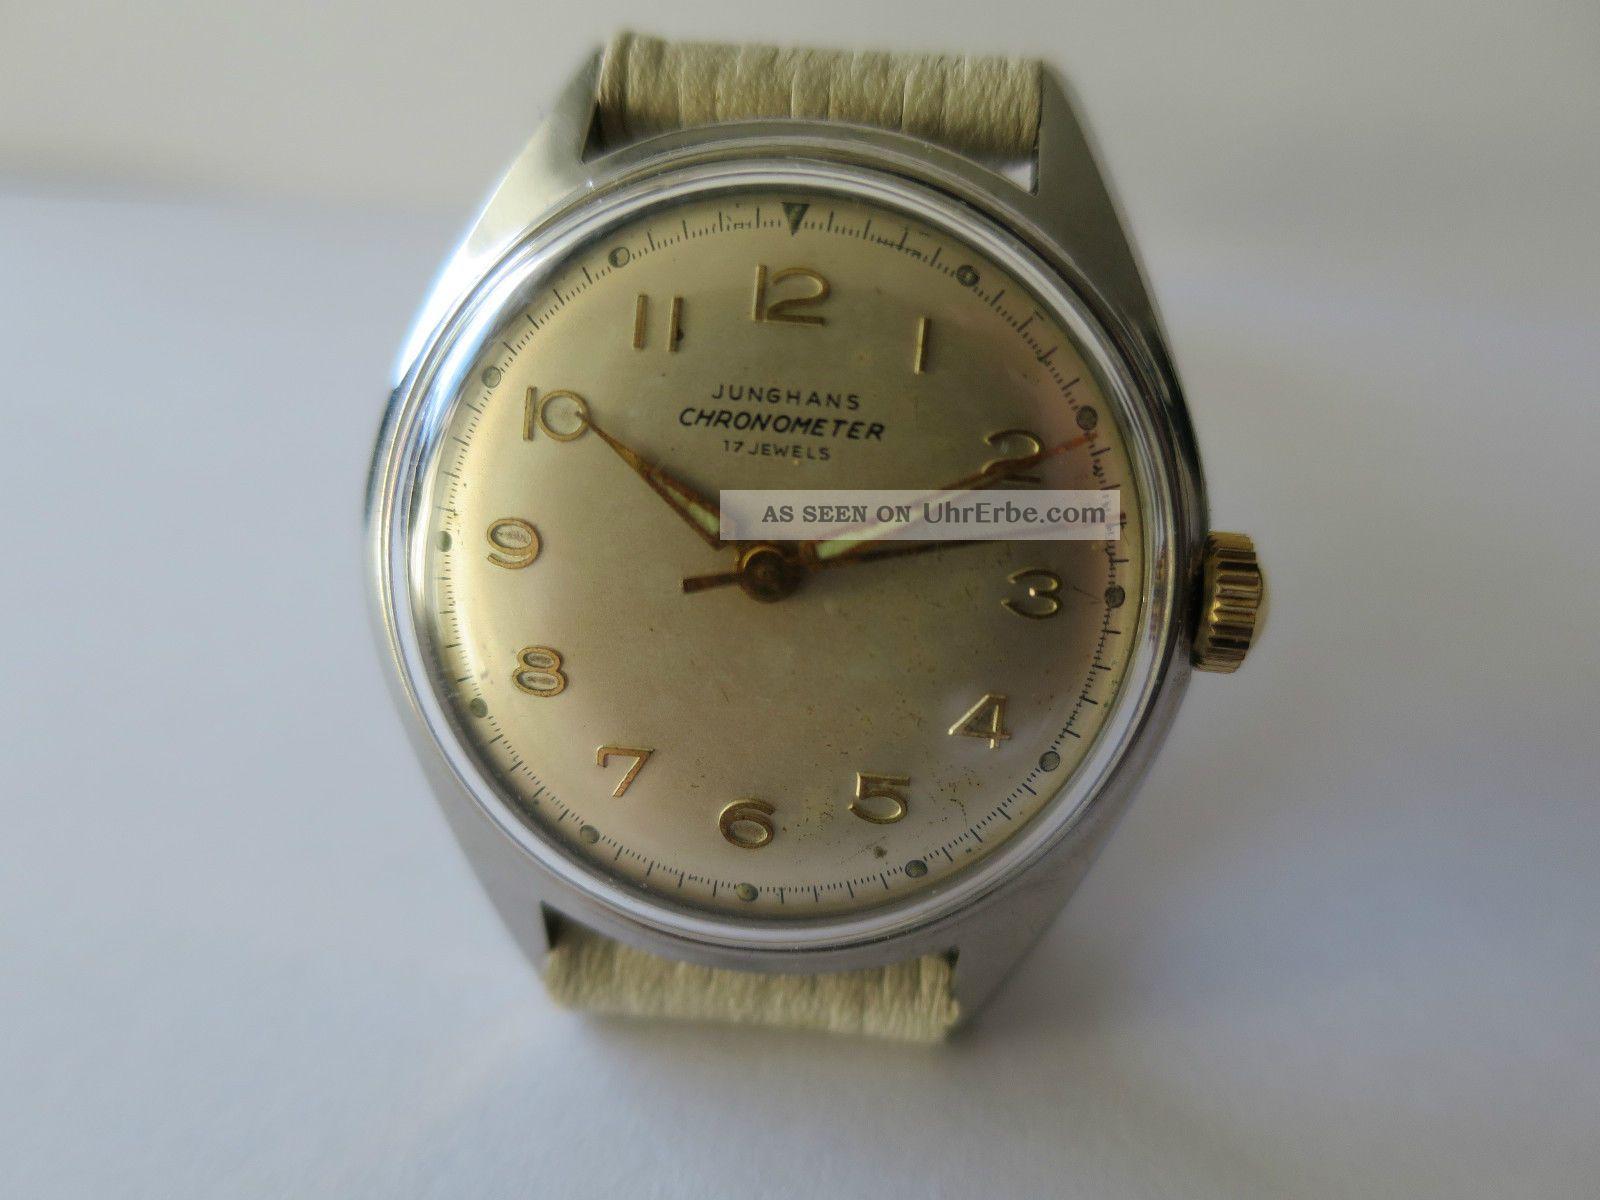 Junghans Chronometer Handaufzug Kaliber 82/1 Armbanduhren Bild